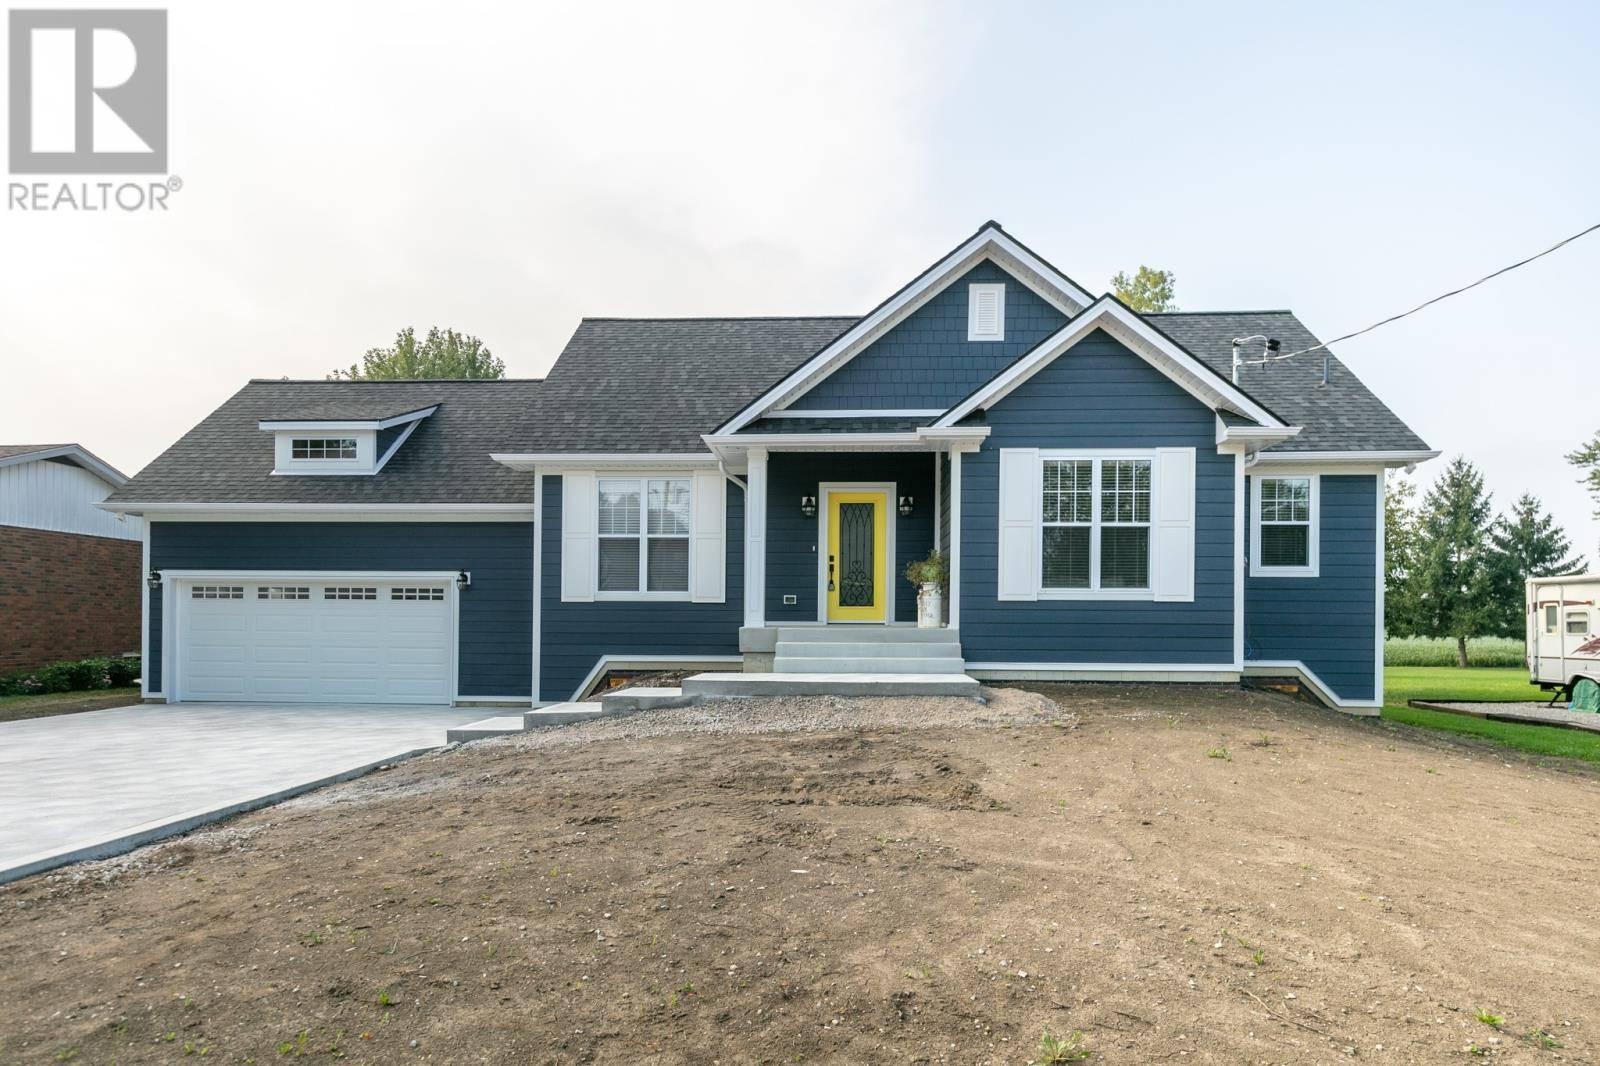 House for sale at 9518 Malden Rd Amherstburg Ontario - MLS: 20004395